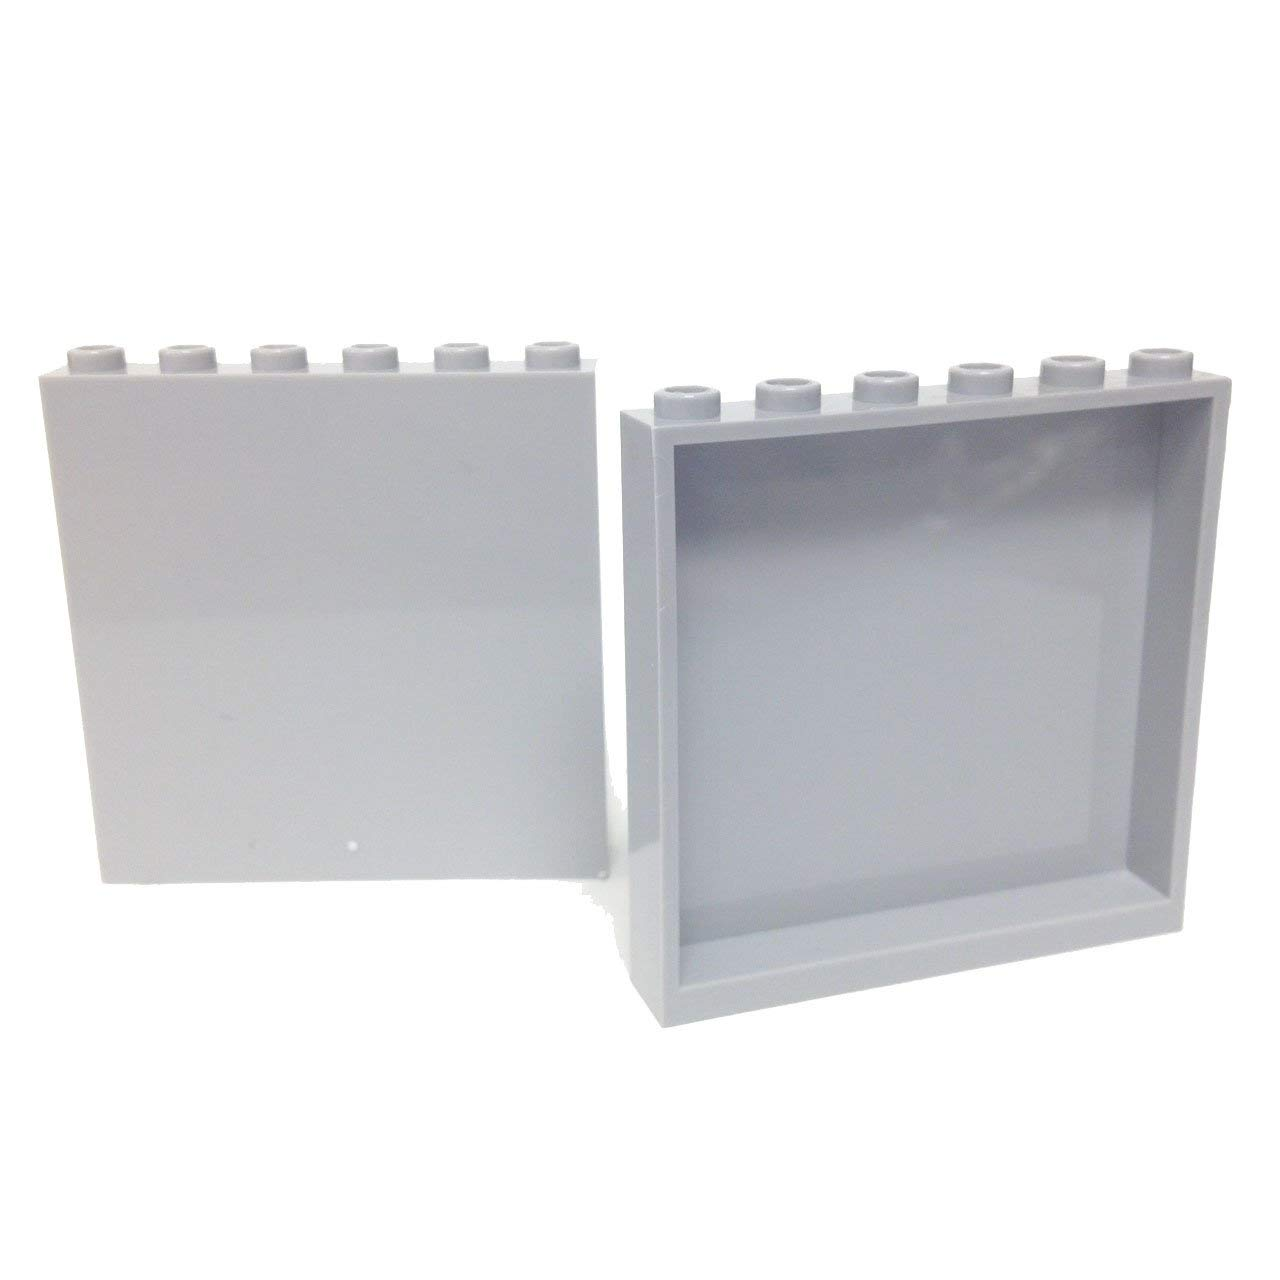 LEGO Lot of 2 Light Bluish Gray 1x6x3 Construction Panels Studs on Sides